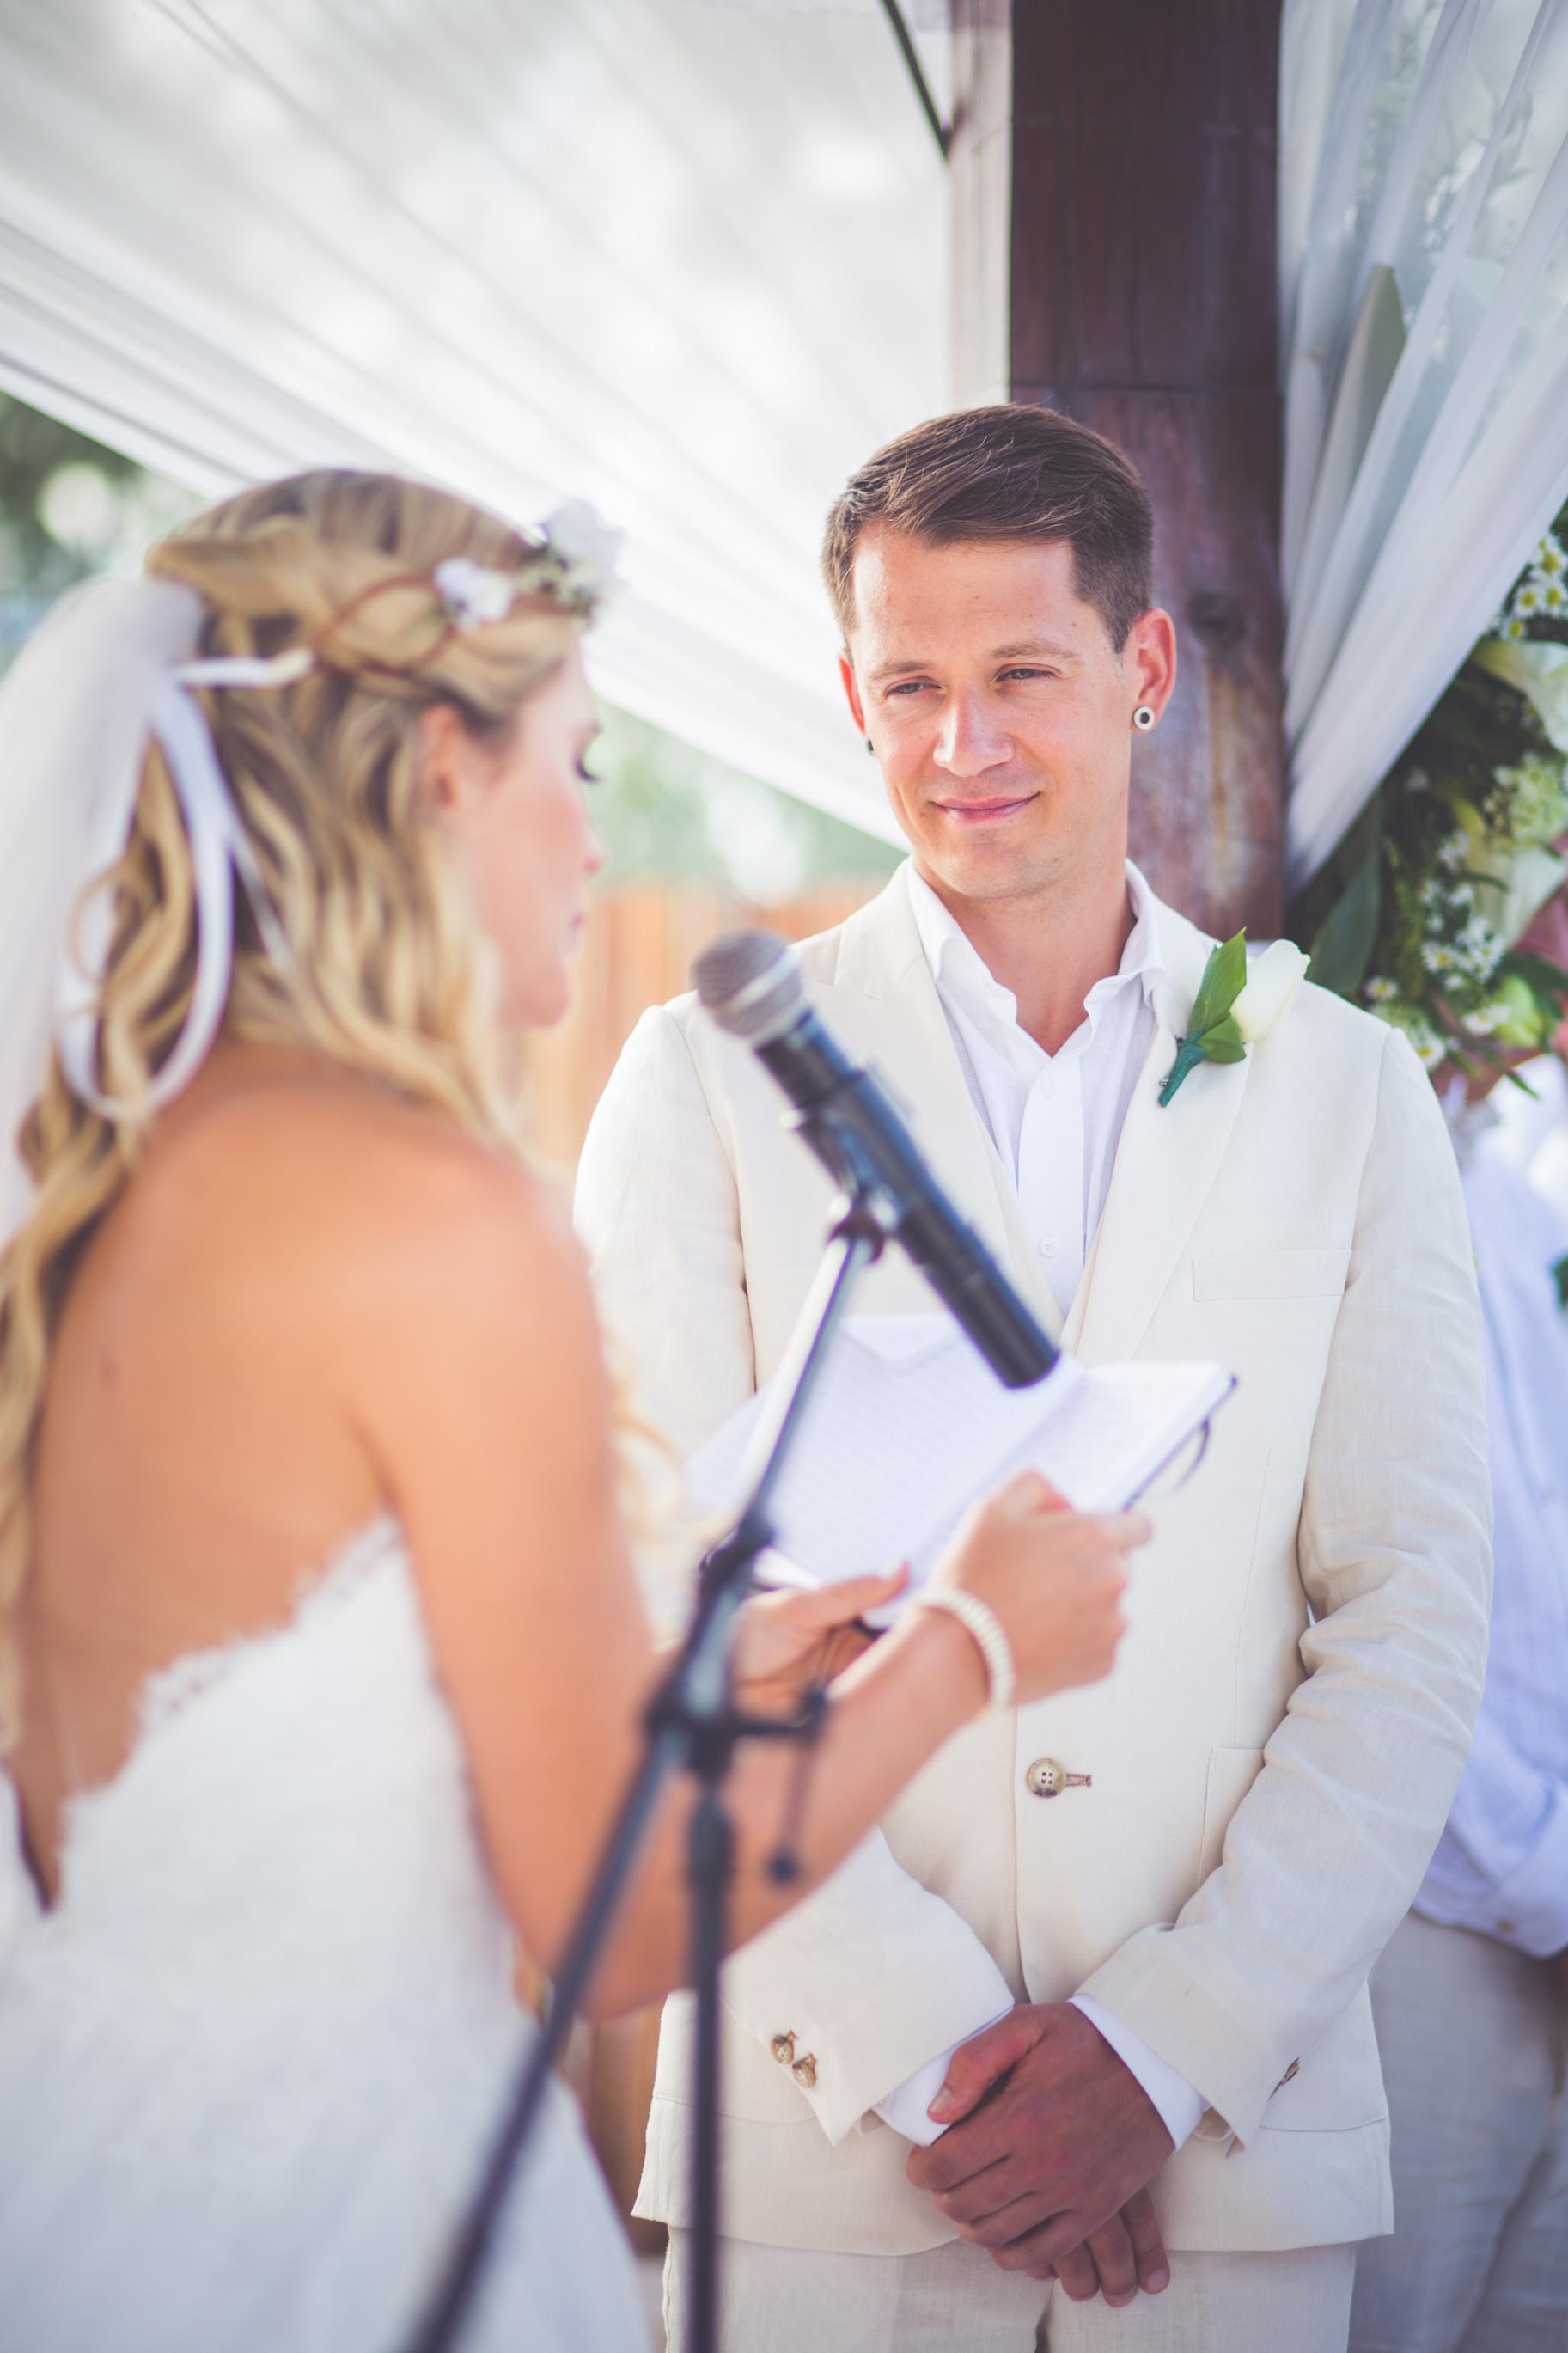 CARMEN-PETER-WEDDING-2016-111.jpg